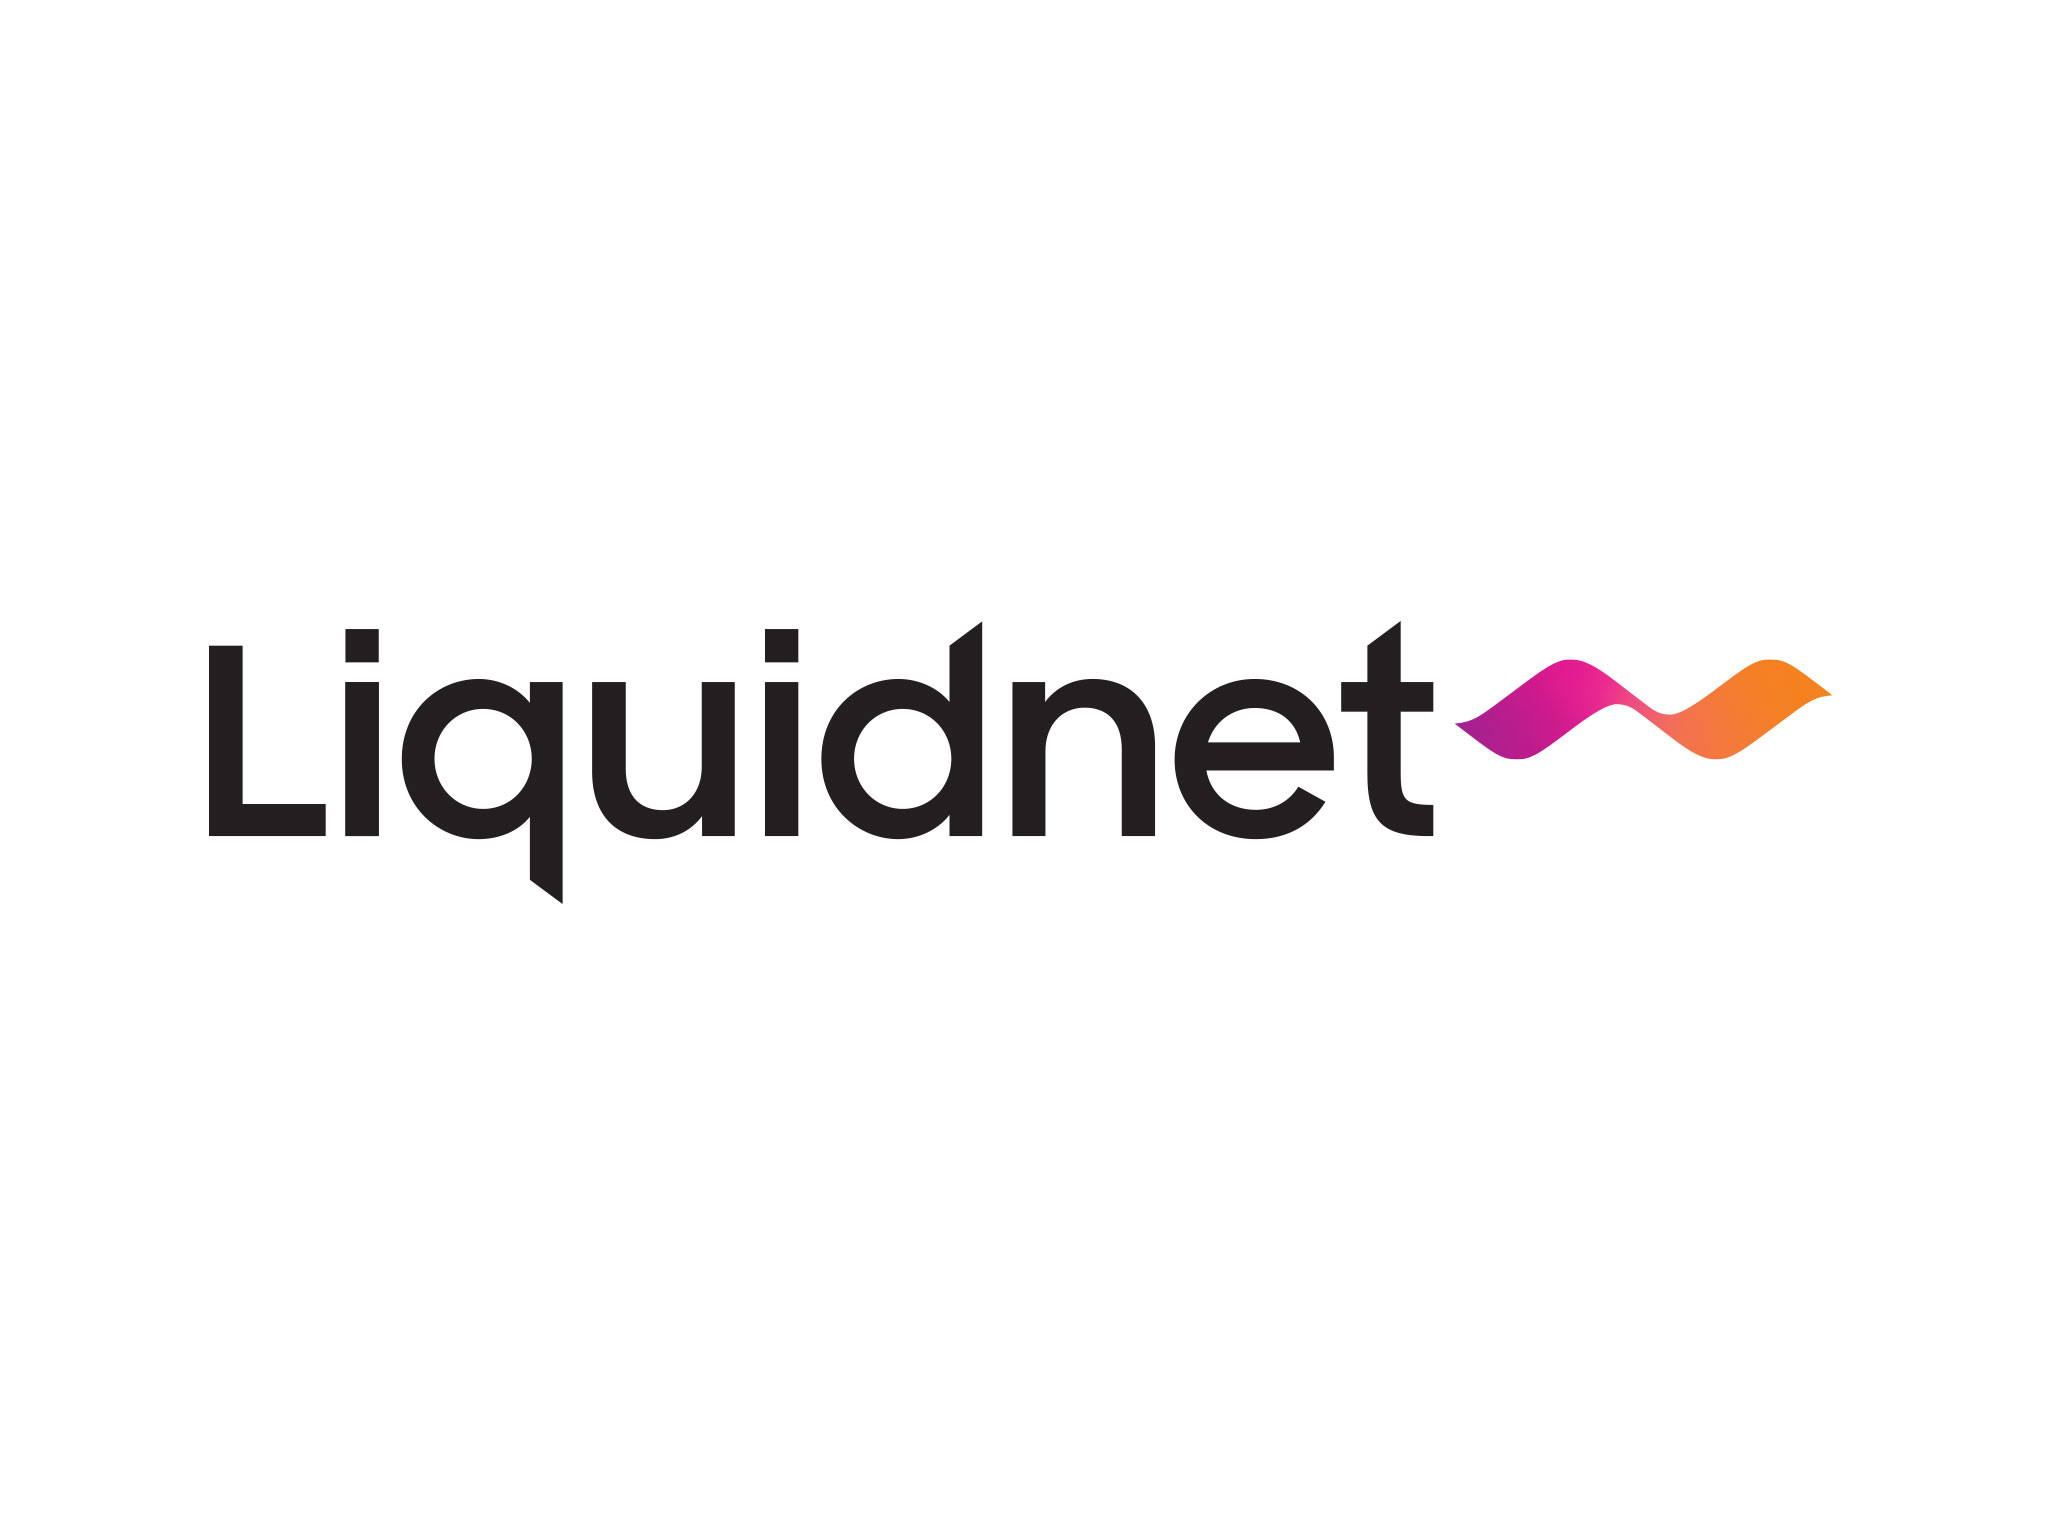 HIERONYMUS_Liquidnet-Logo_New